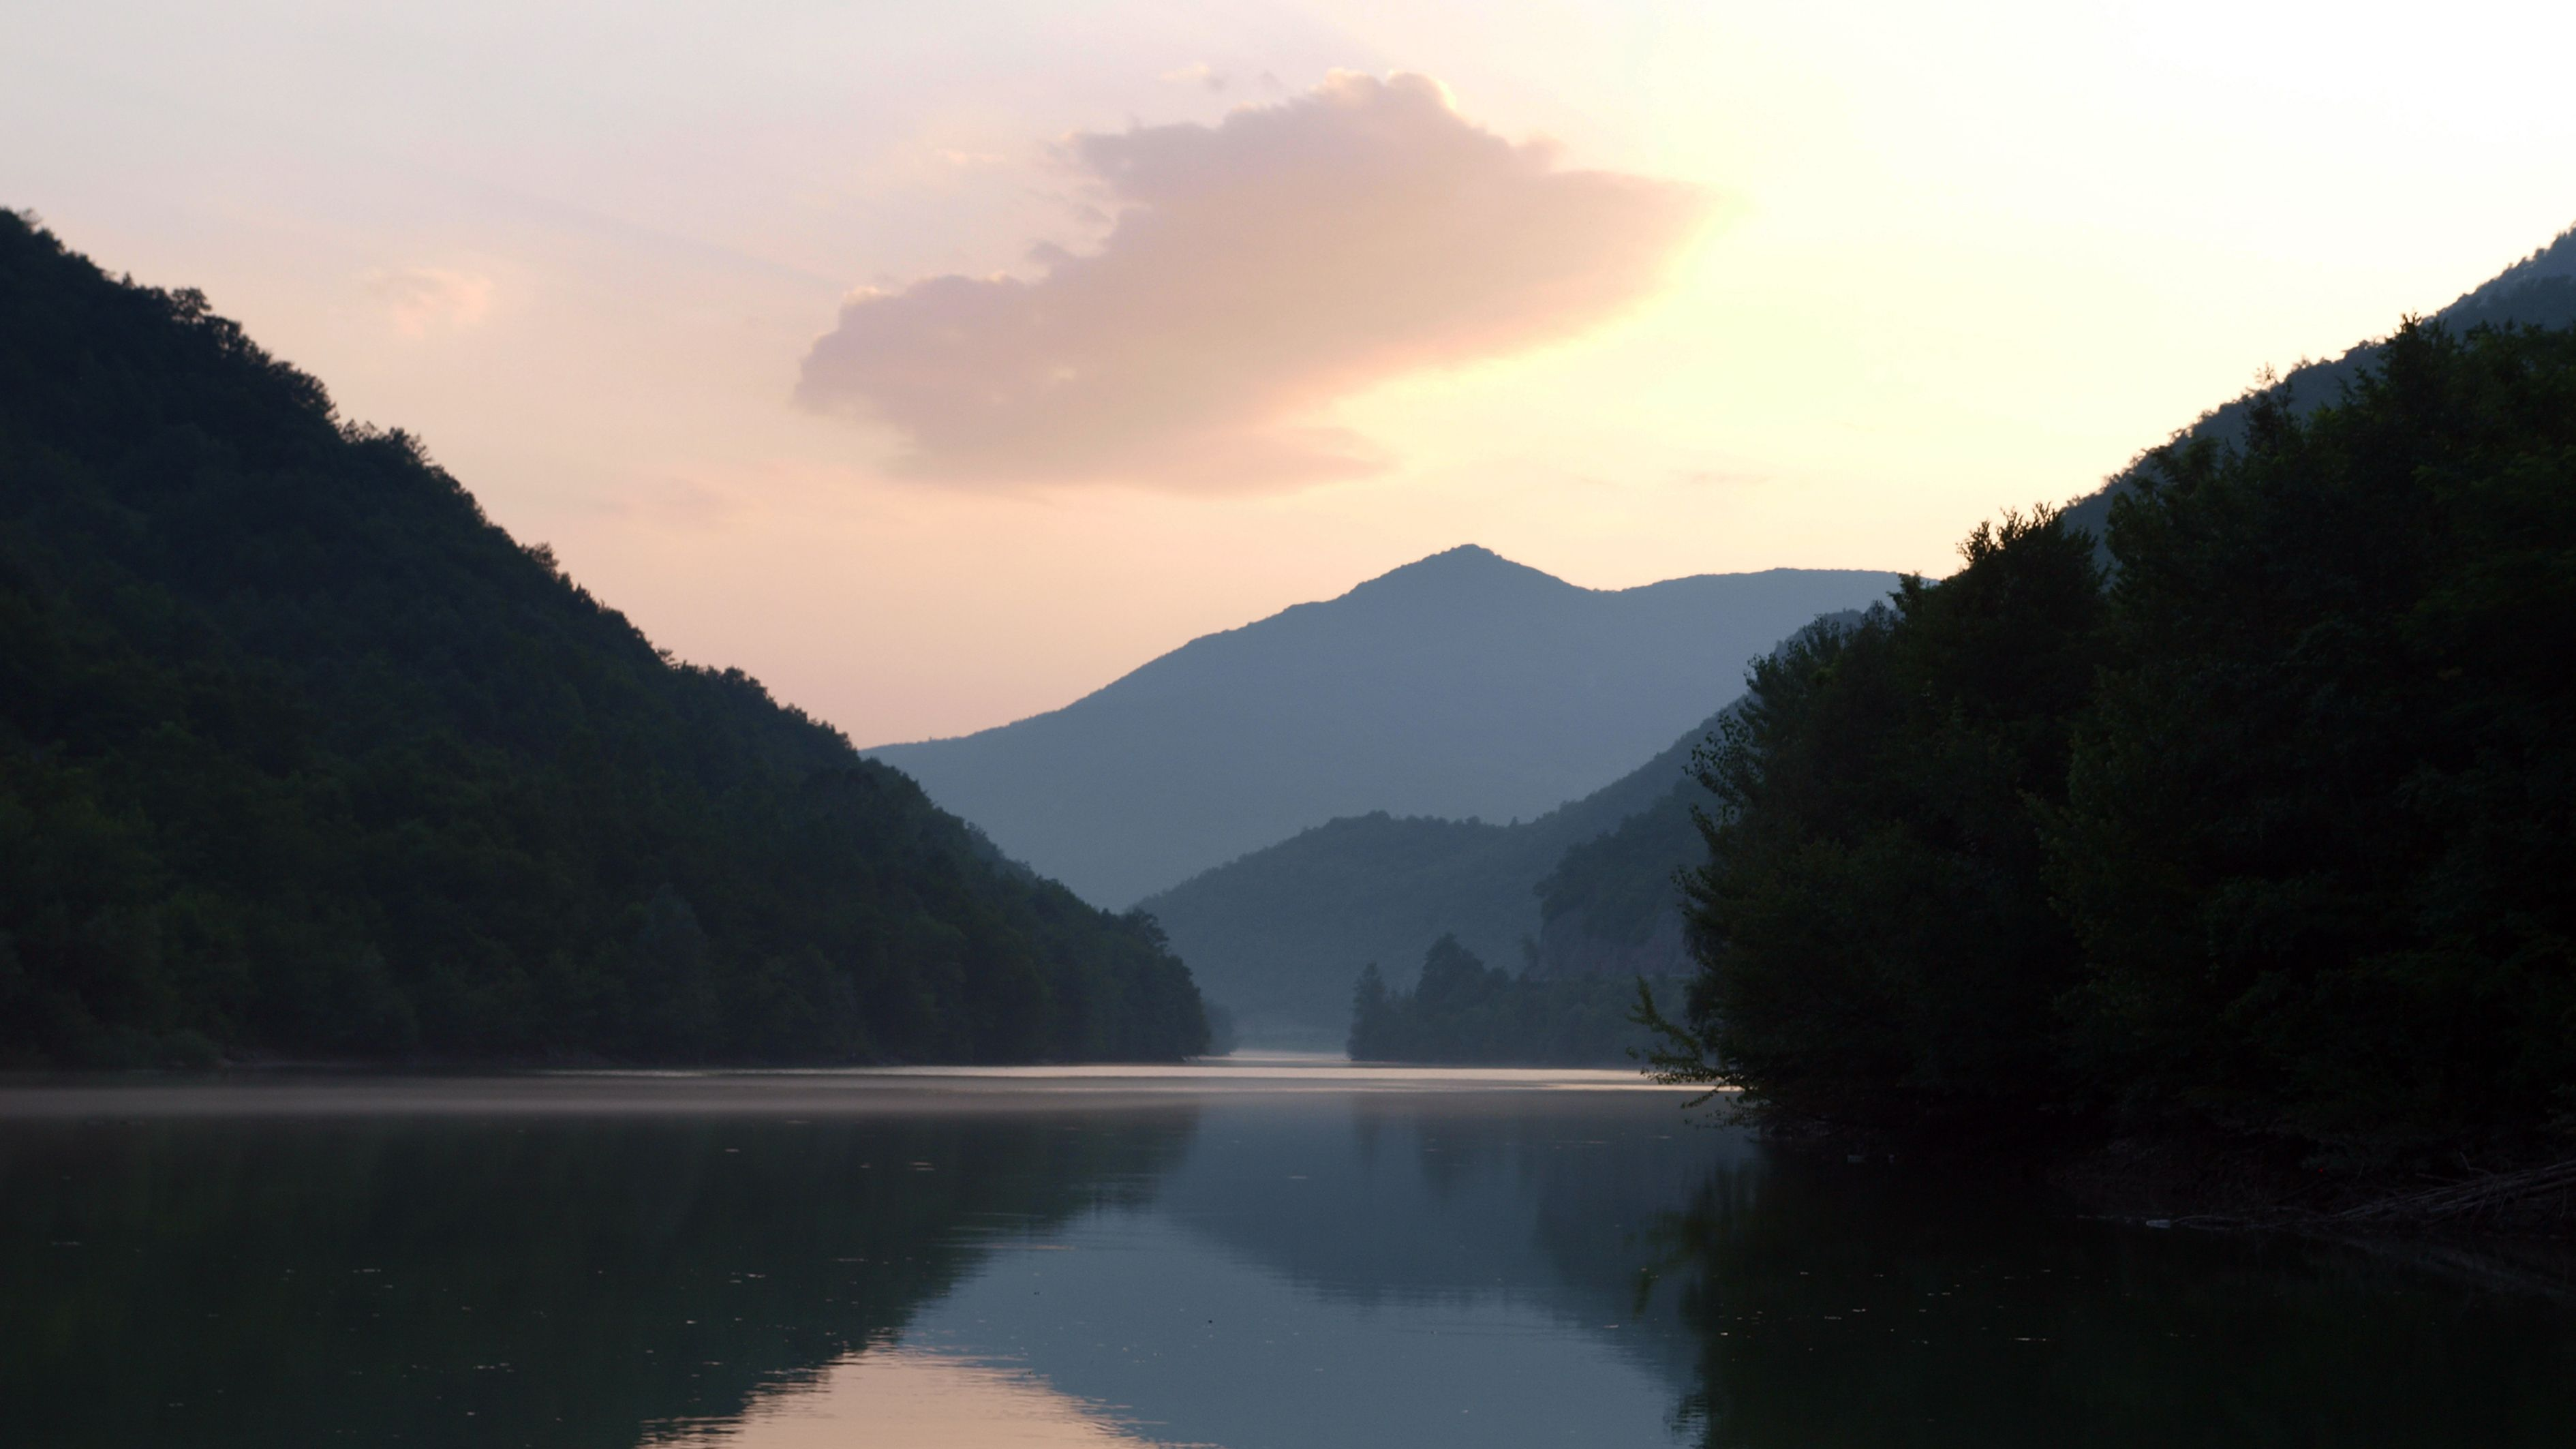 Visegradsko Lake Republika Srpska Bosnia And Herzegovina Republika Srpska Water Lake